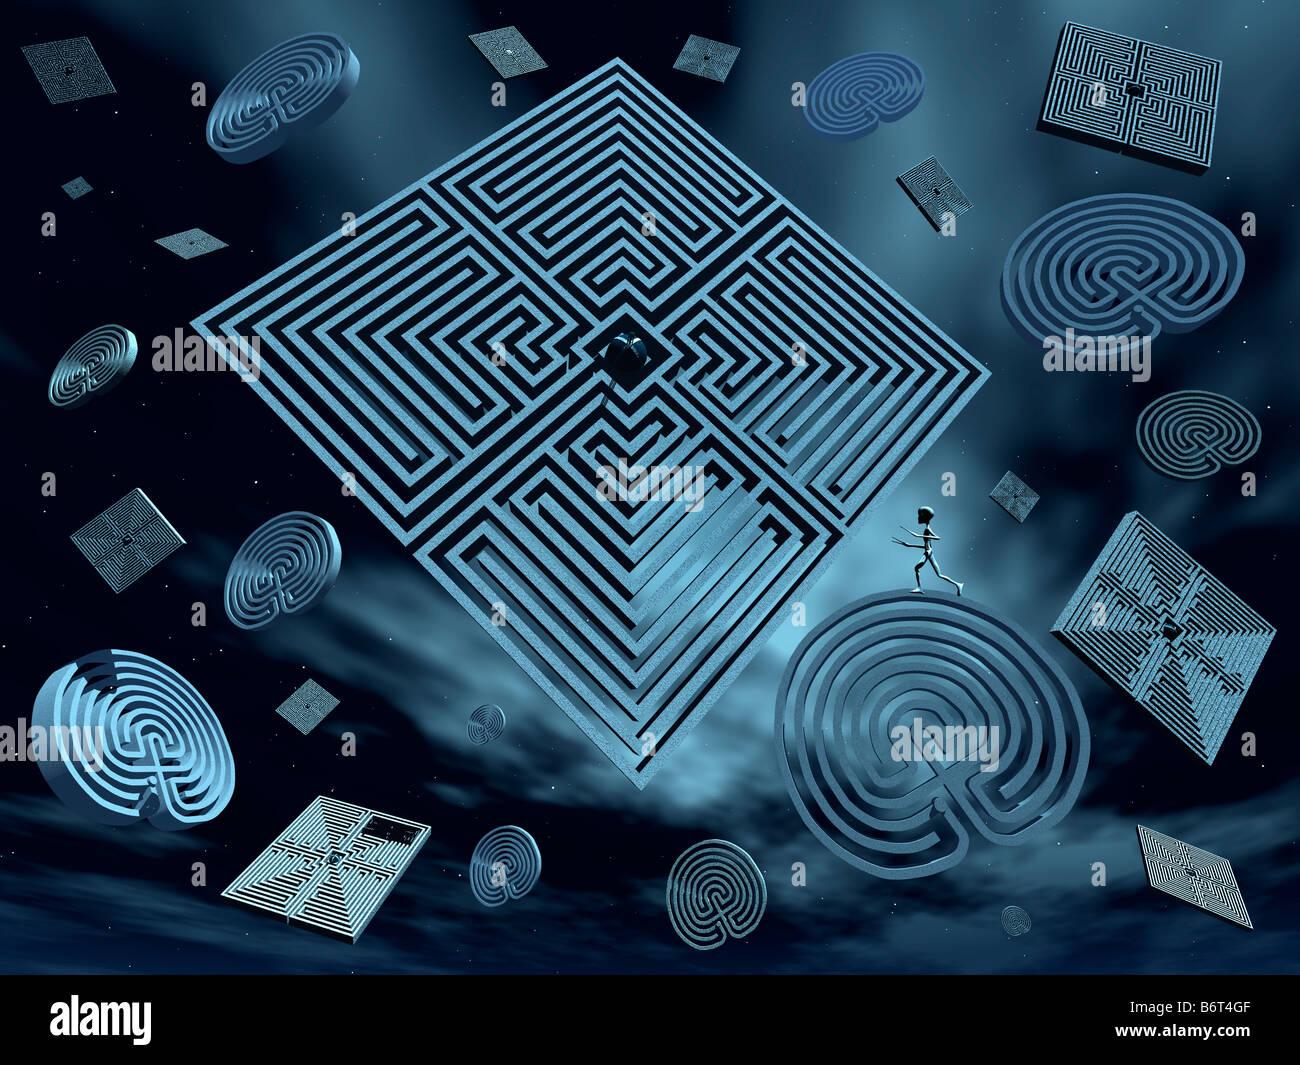 Universal Puzzels A 3D Conceptual Image - Stock Image